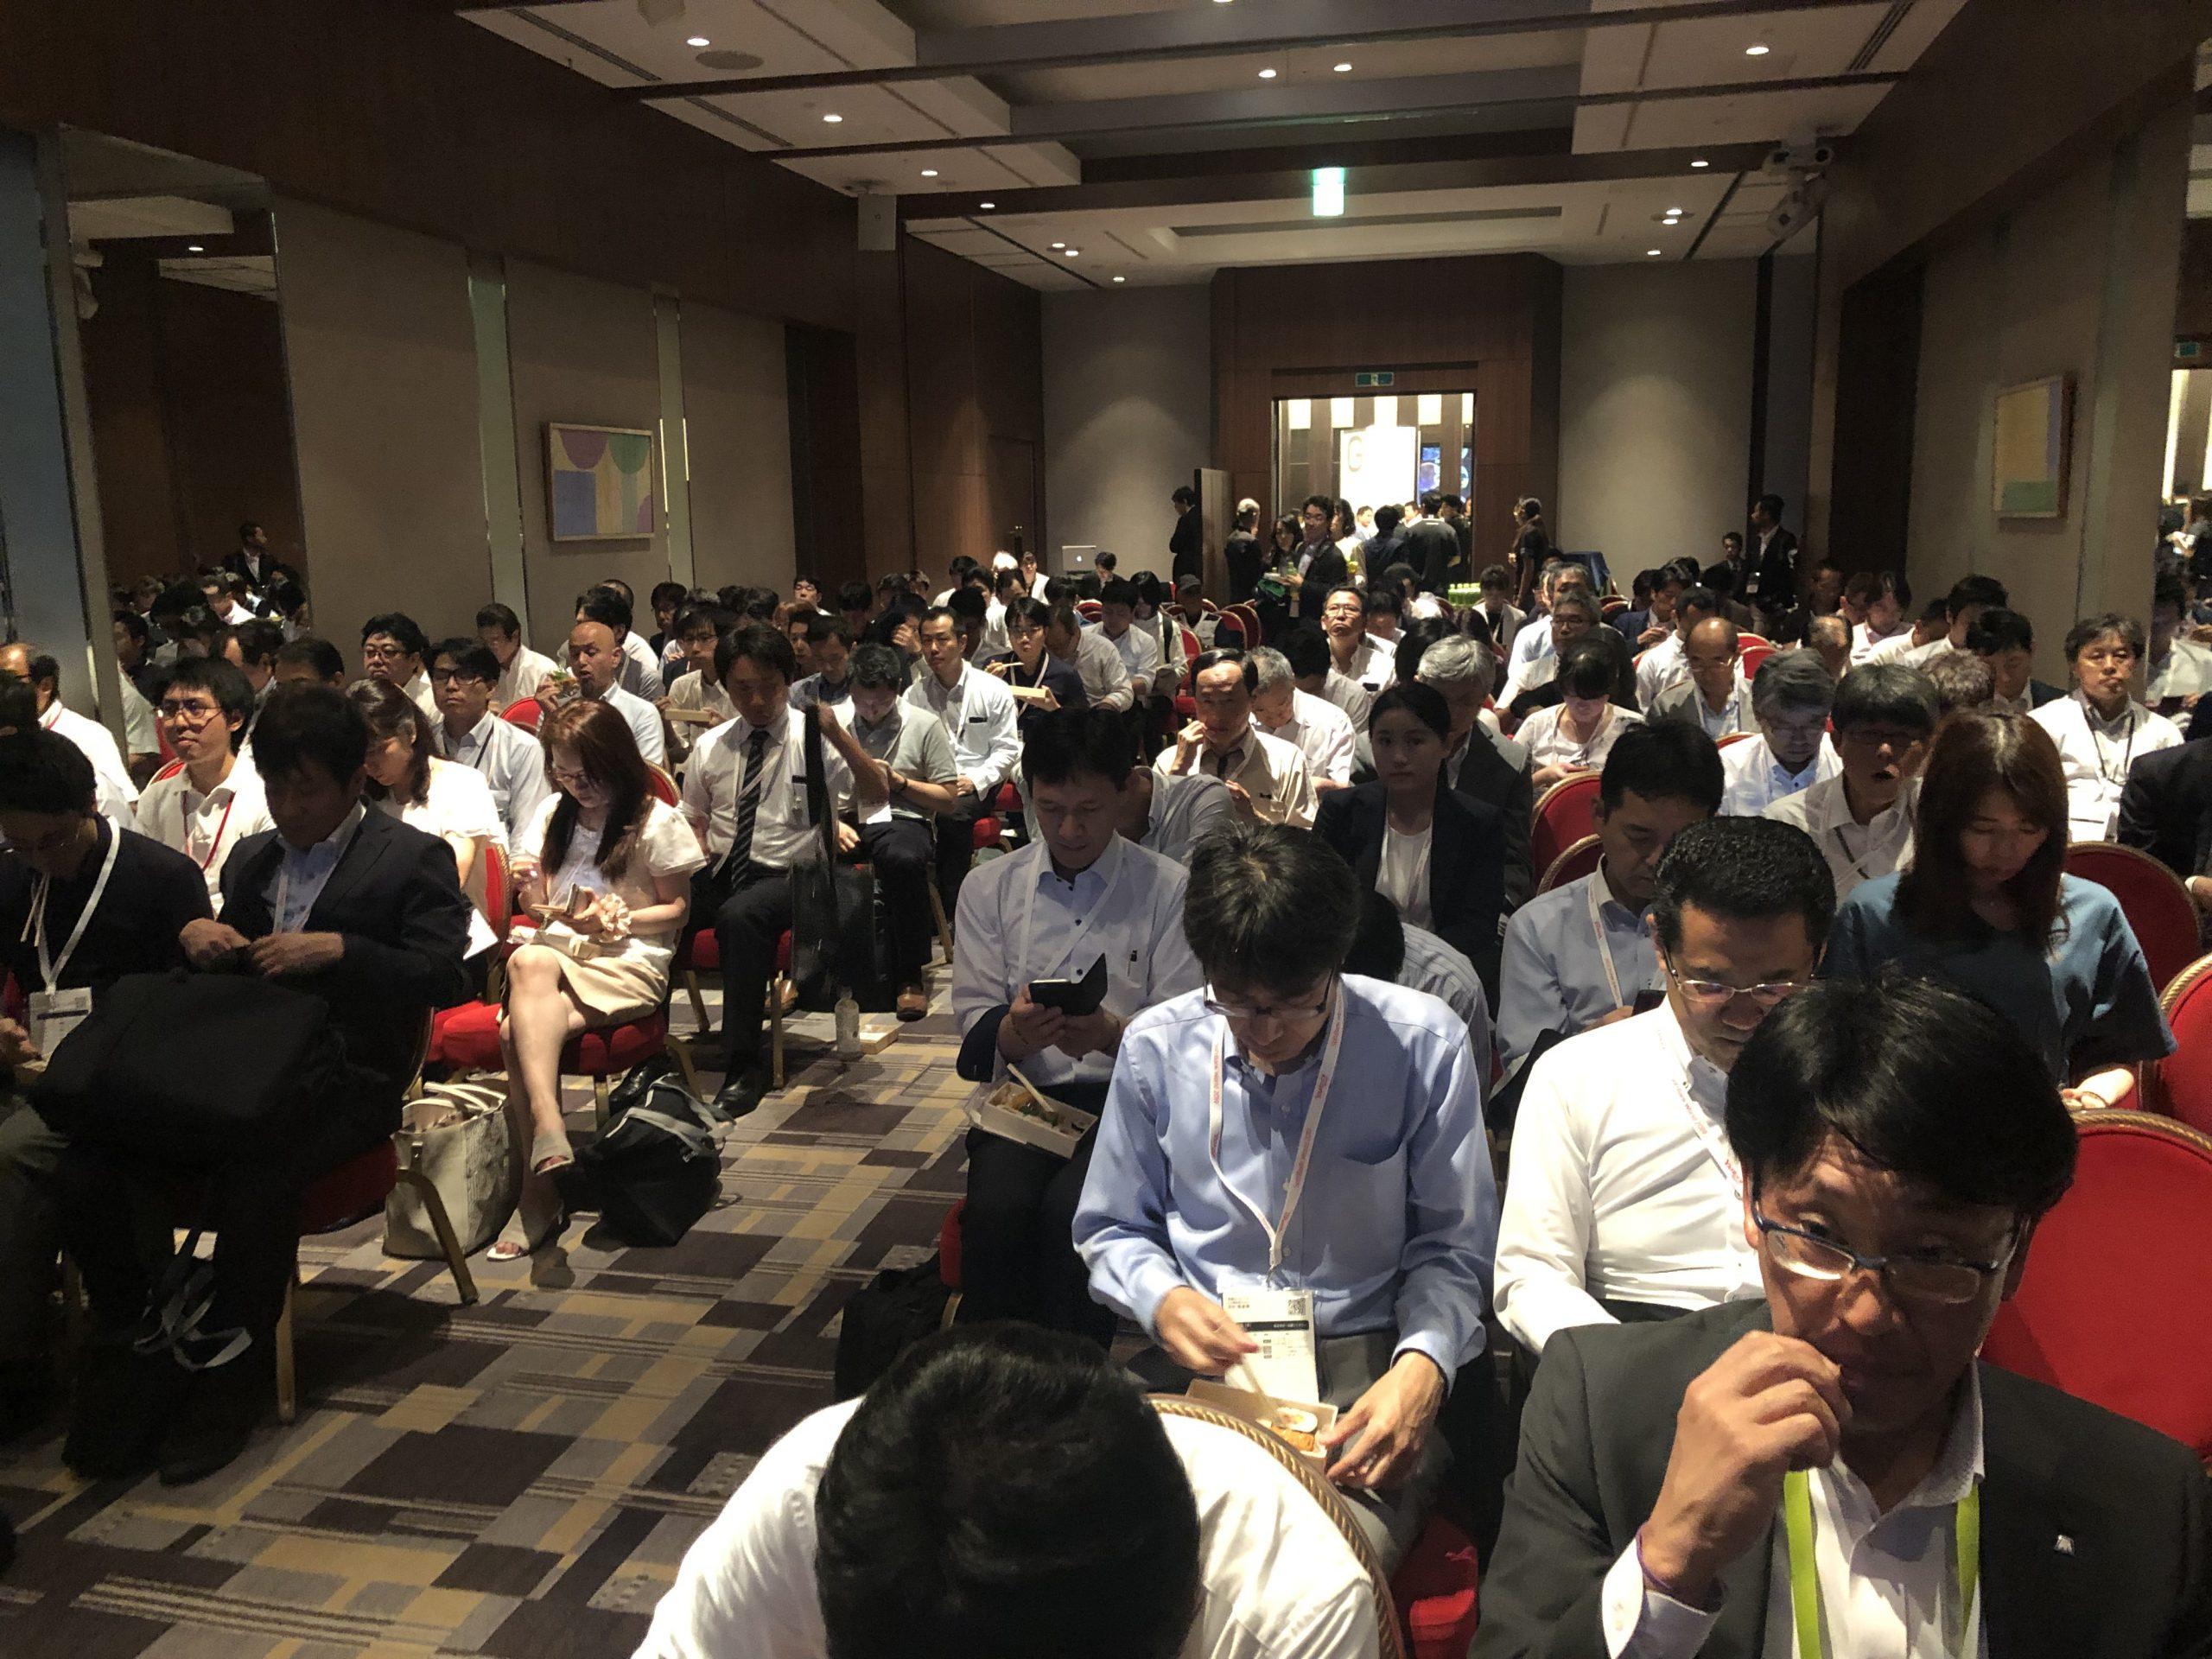 Packed room at VANTIQ CEO Marty Sprinzen's SoftBank World 2019 keynote